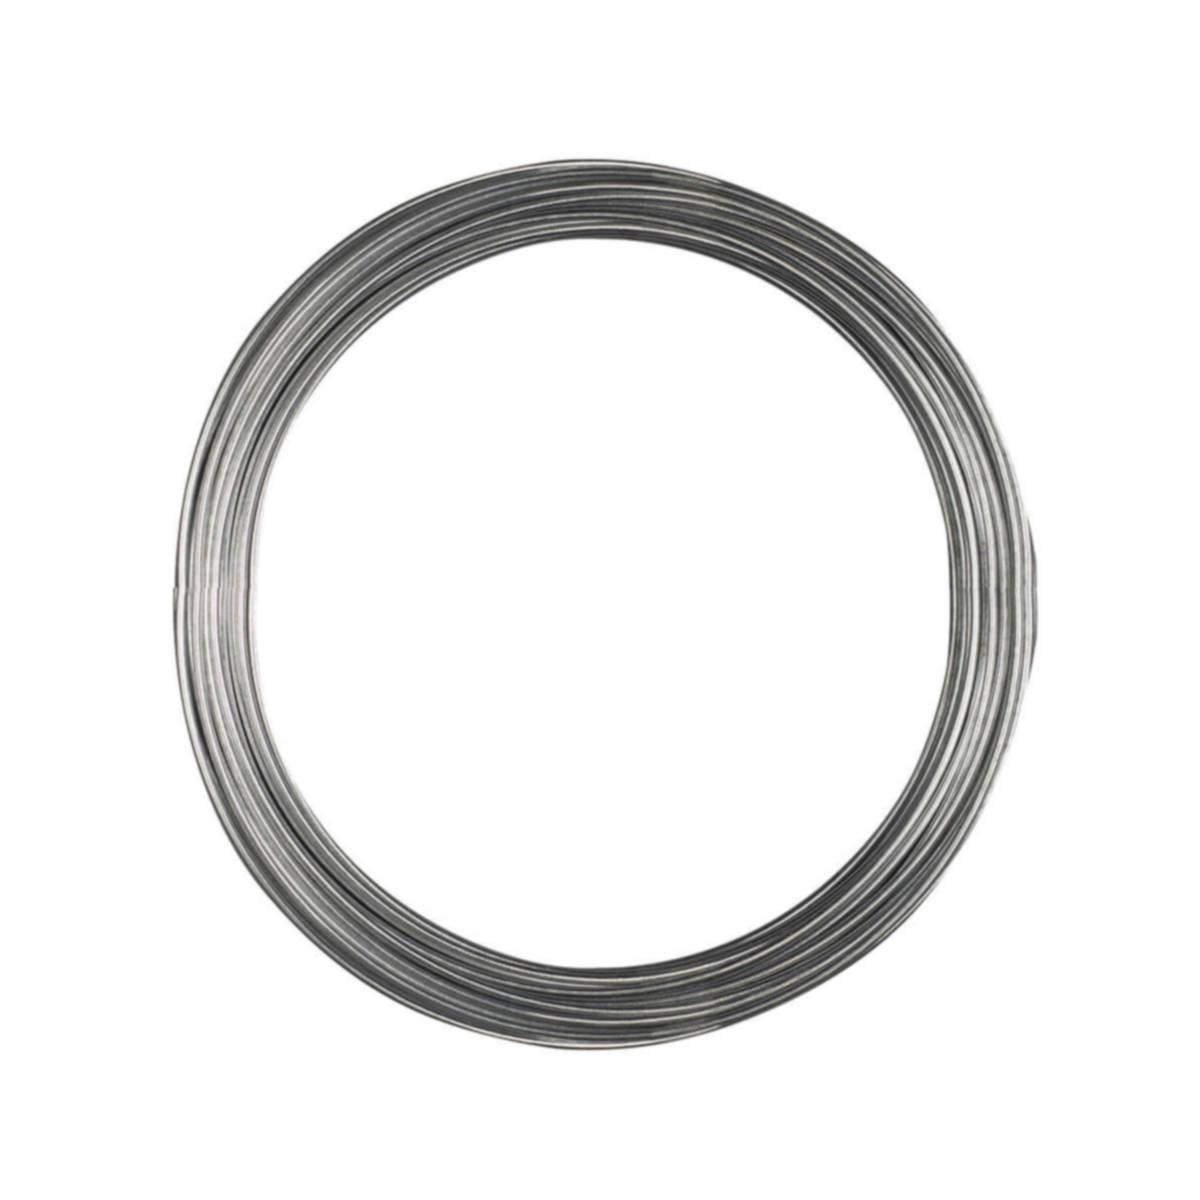 Ben-Mor Cables 93000